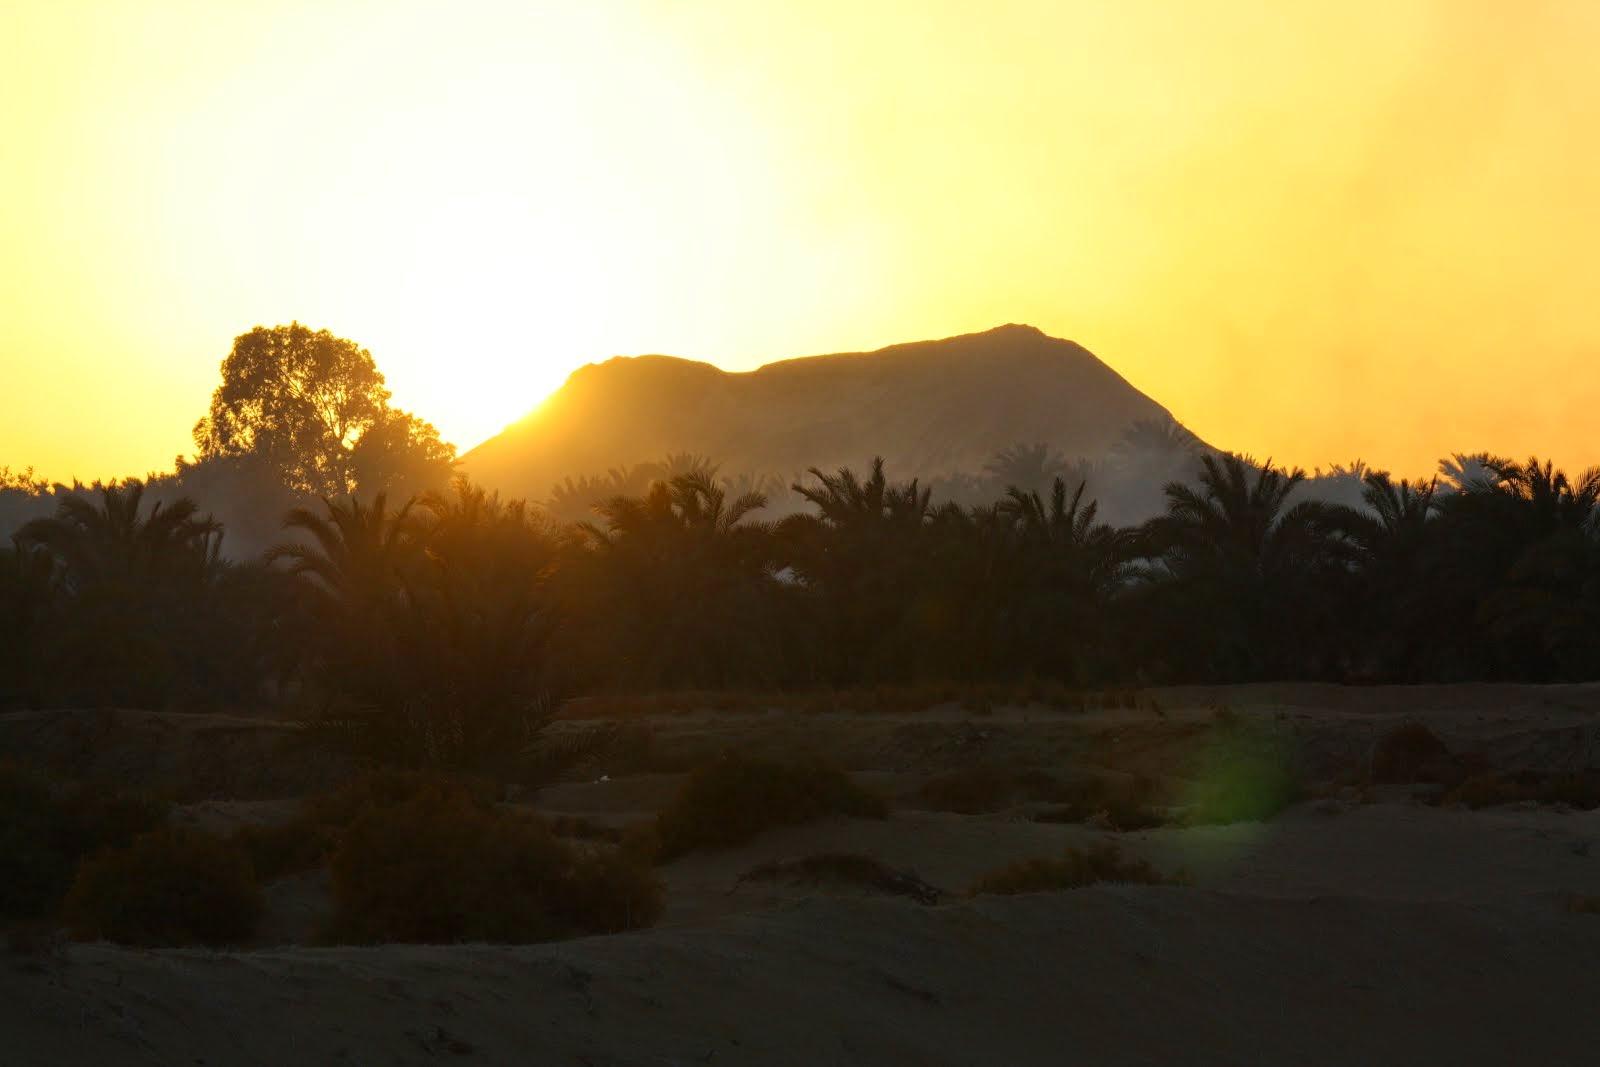 A View at the Western Desert Oasis Village of El Heiz